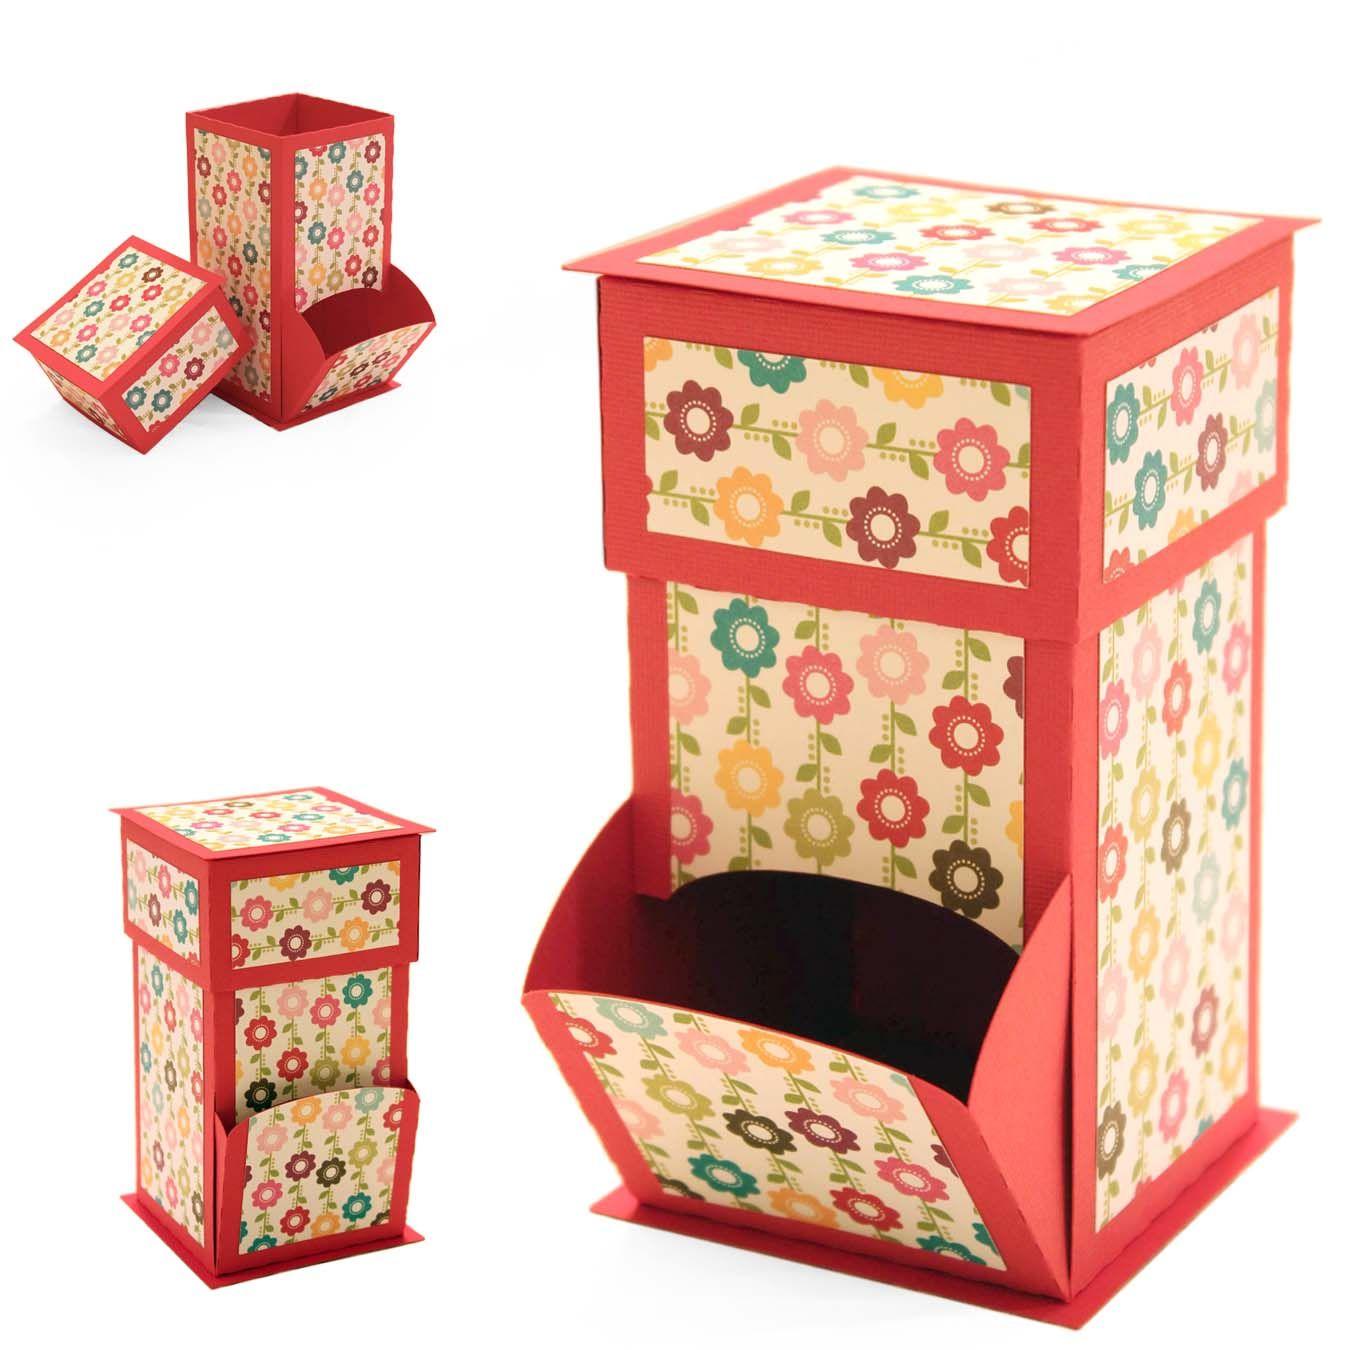 anleitung bonbon spender cajas canastas pinterest verpackung schachteln und box. Black Bedroom Furniture Sets. Home Design Ideas